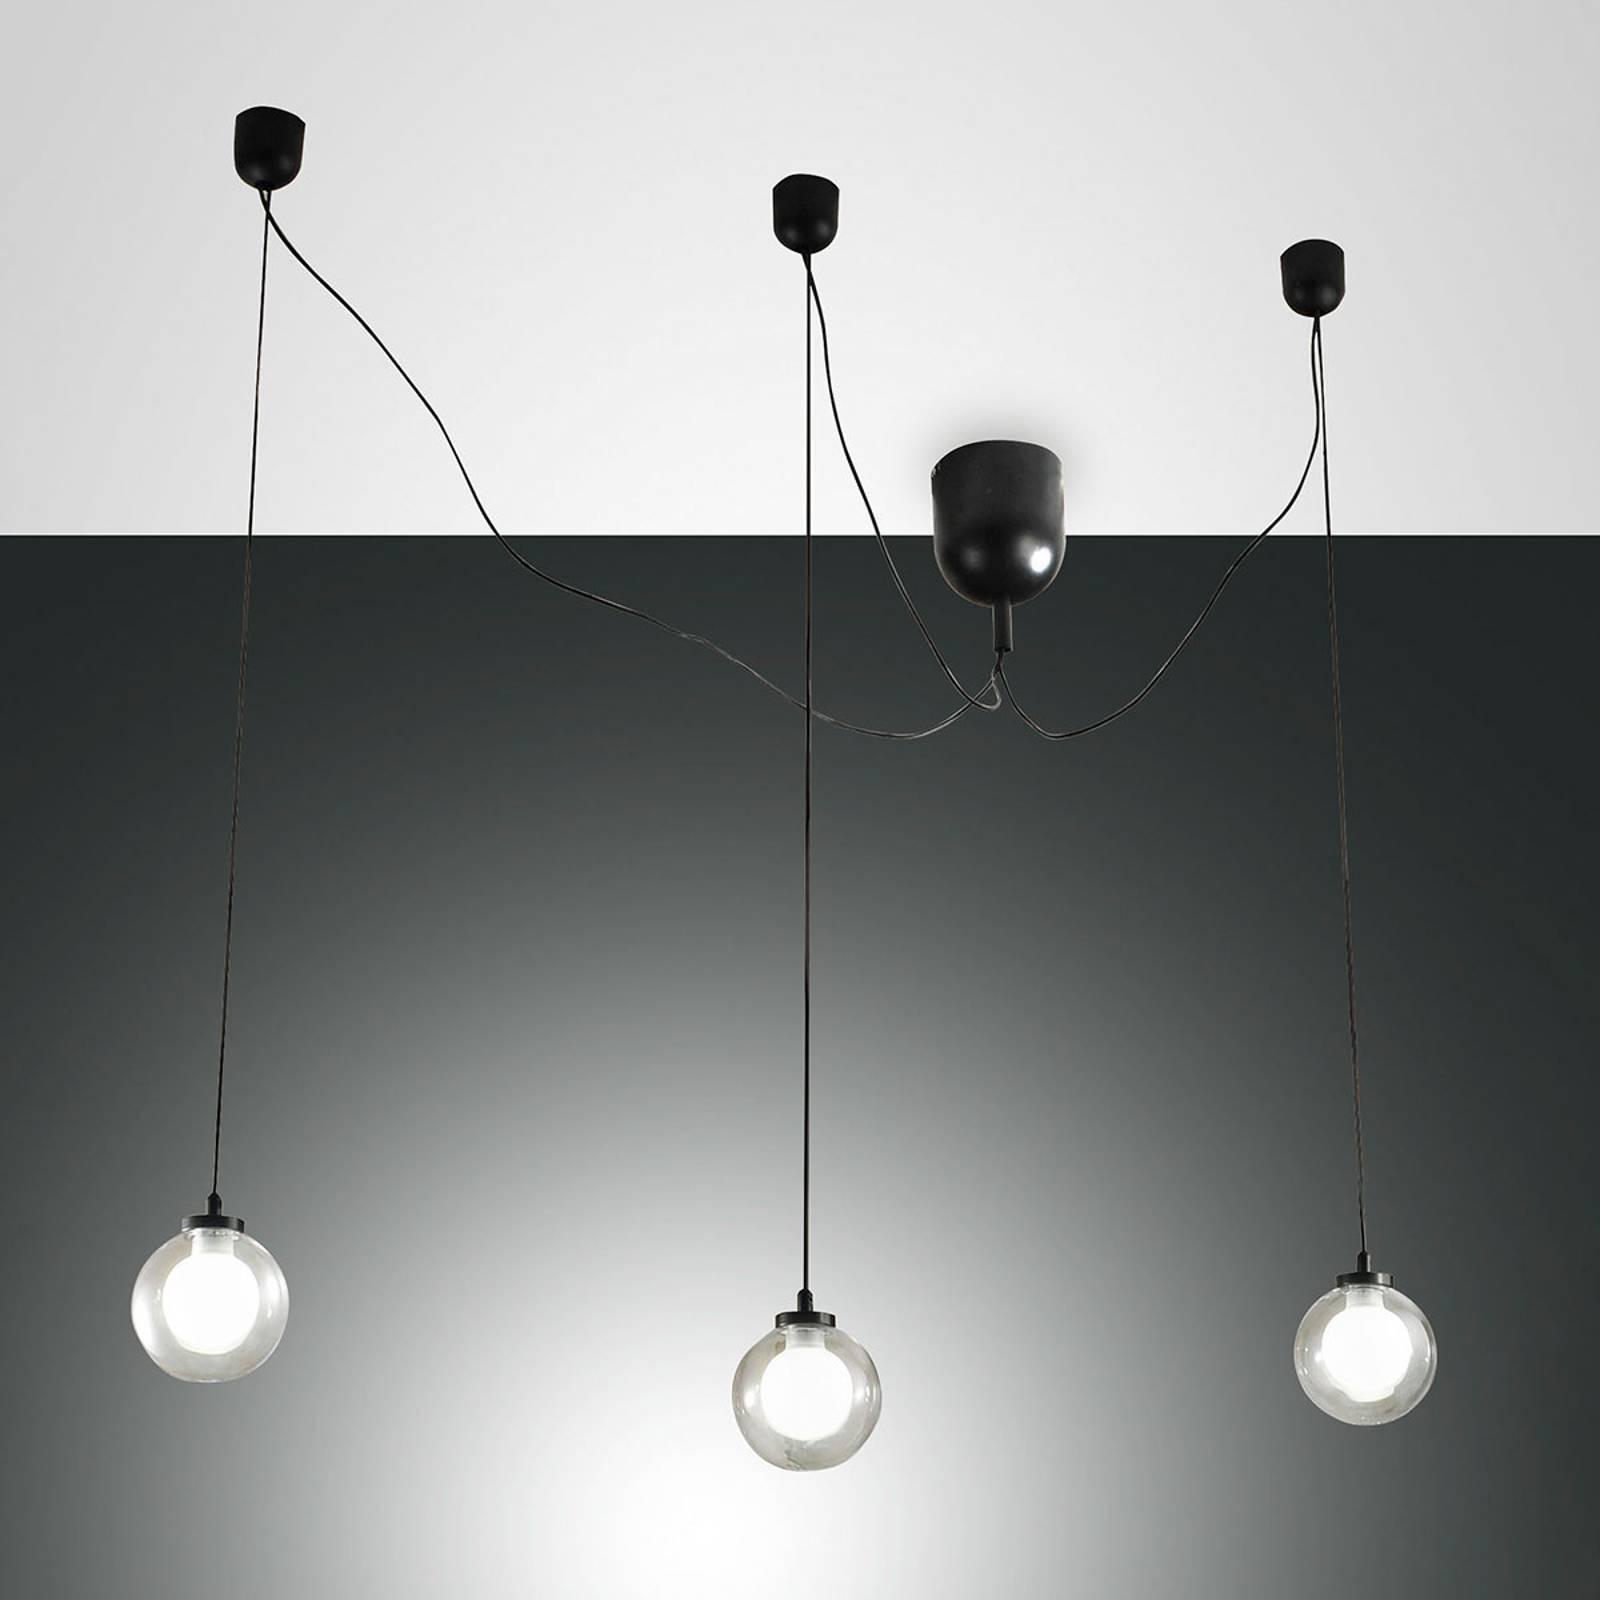 LED-Hängeleuchte Blog, 3-flammig